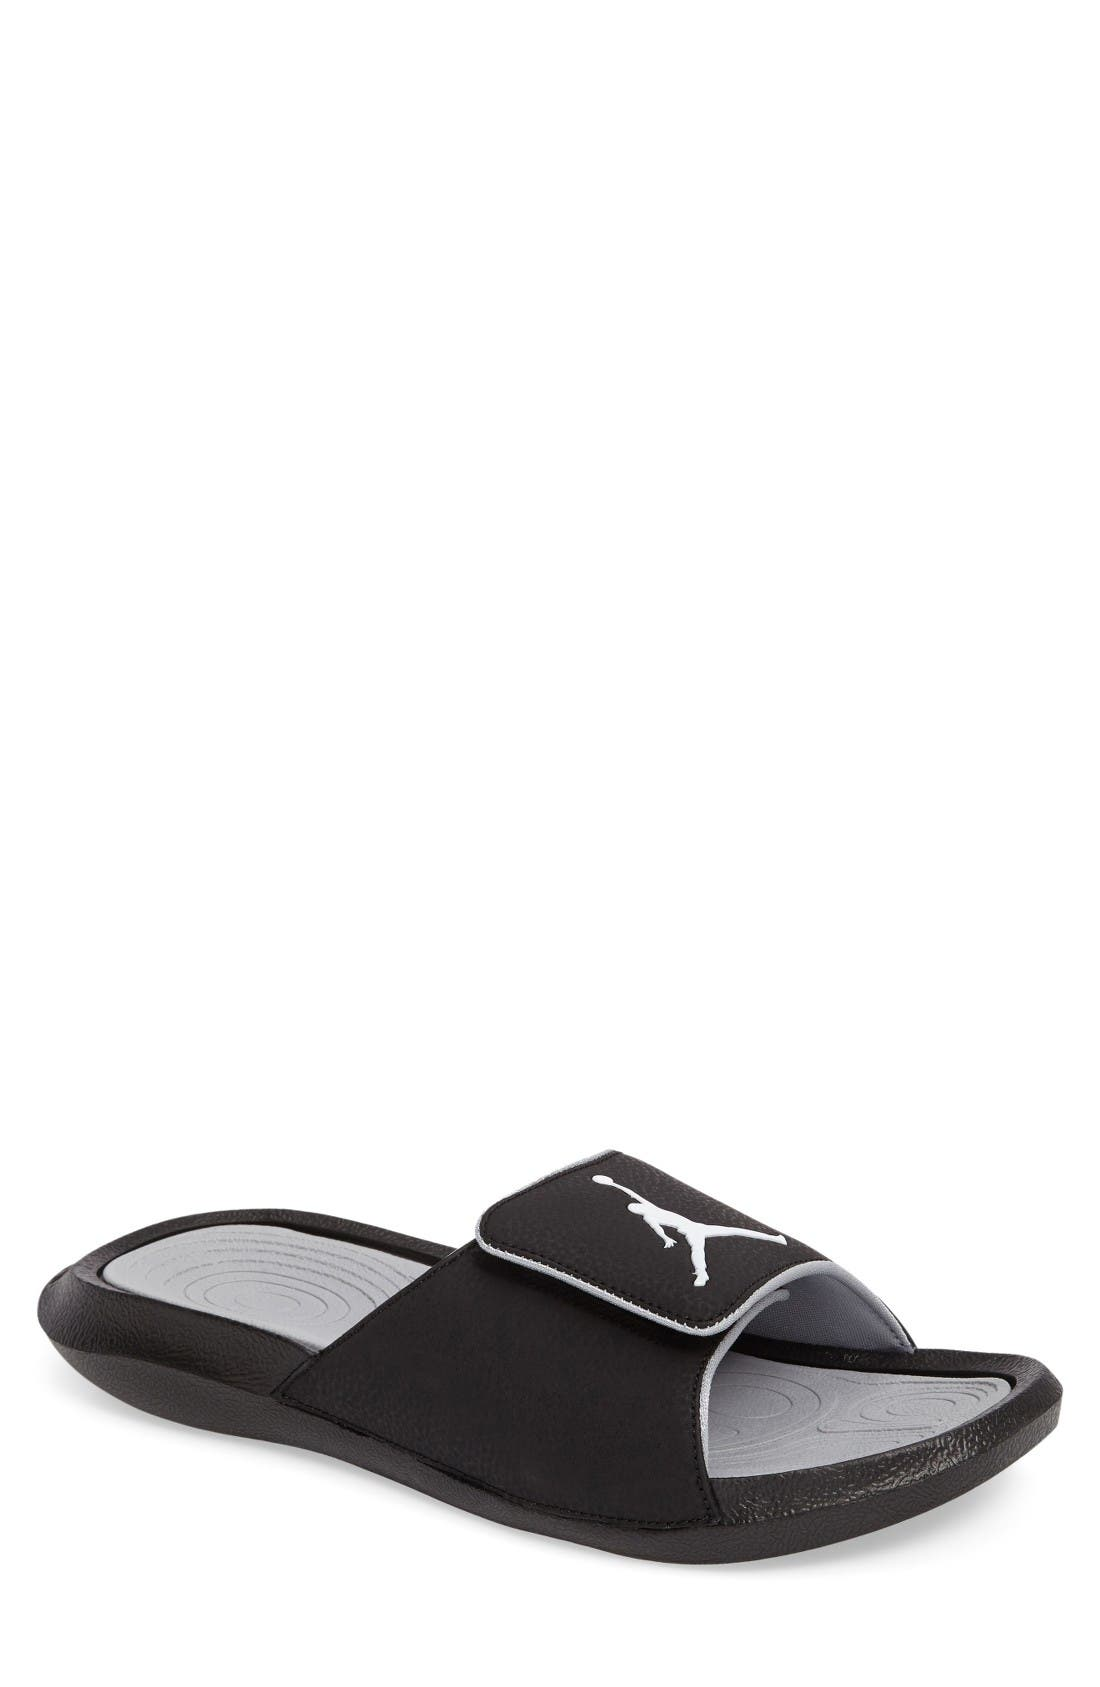 NIKE Jordan Hydro 6 Slide Sandal